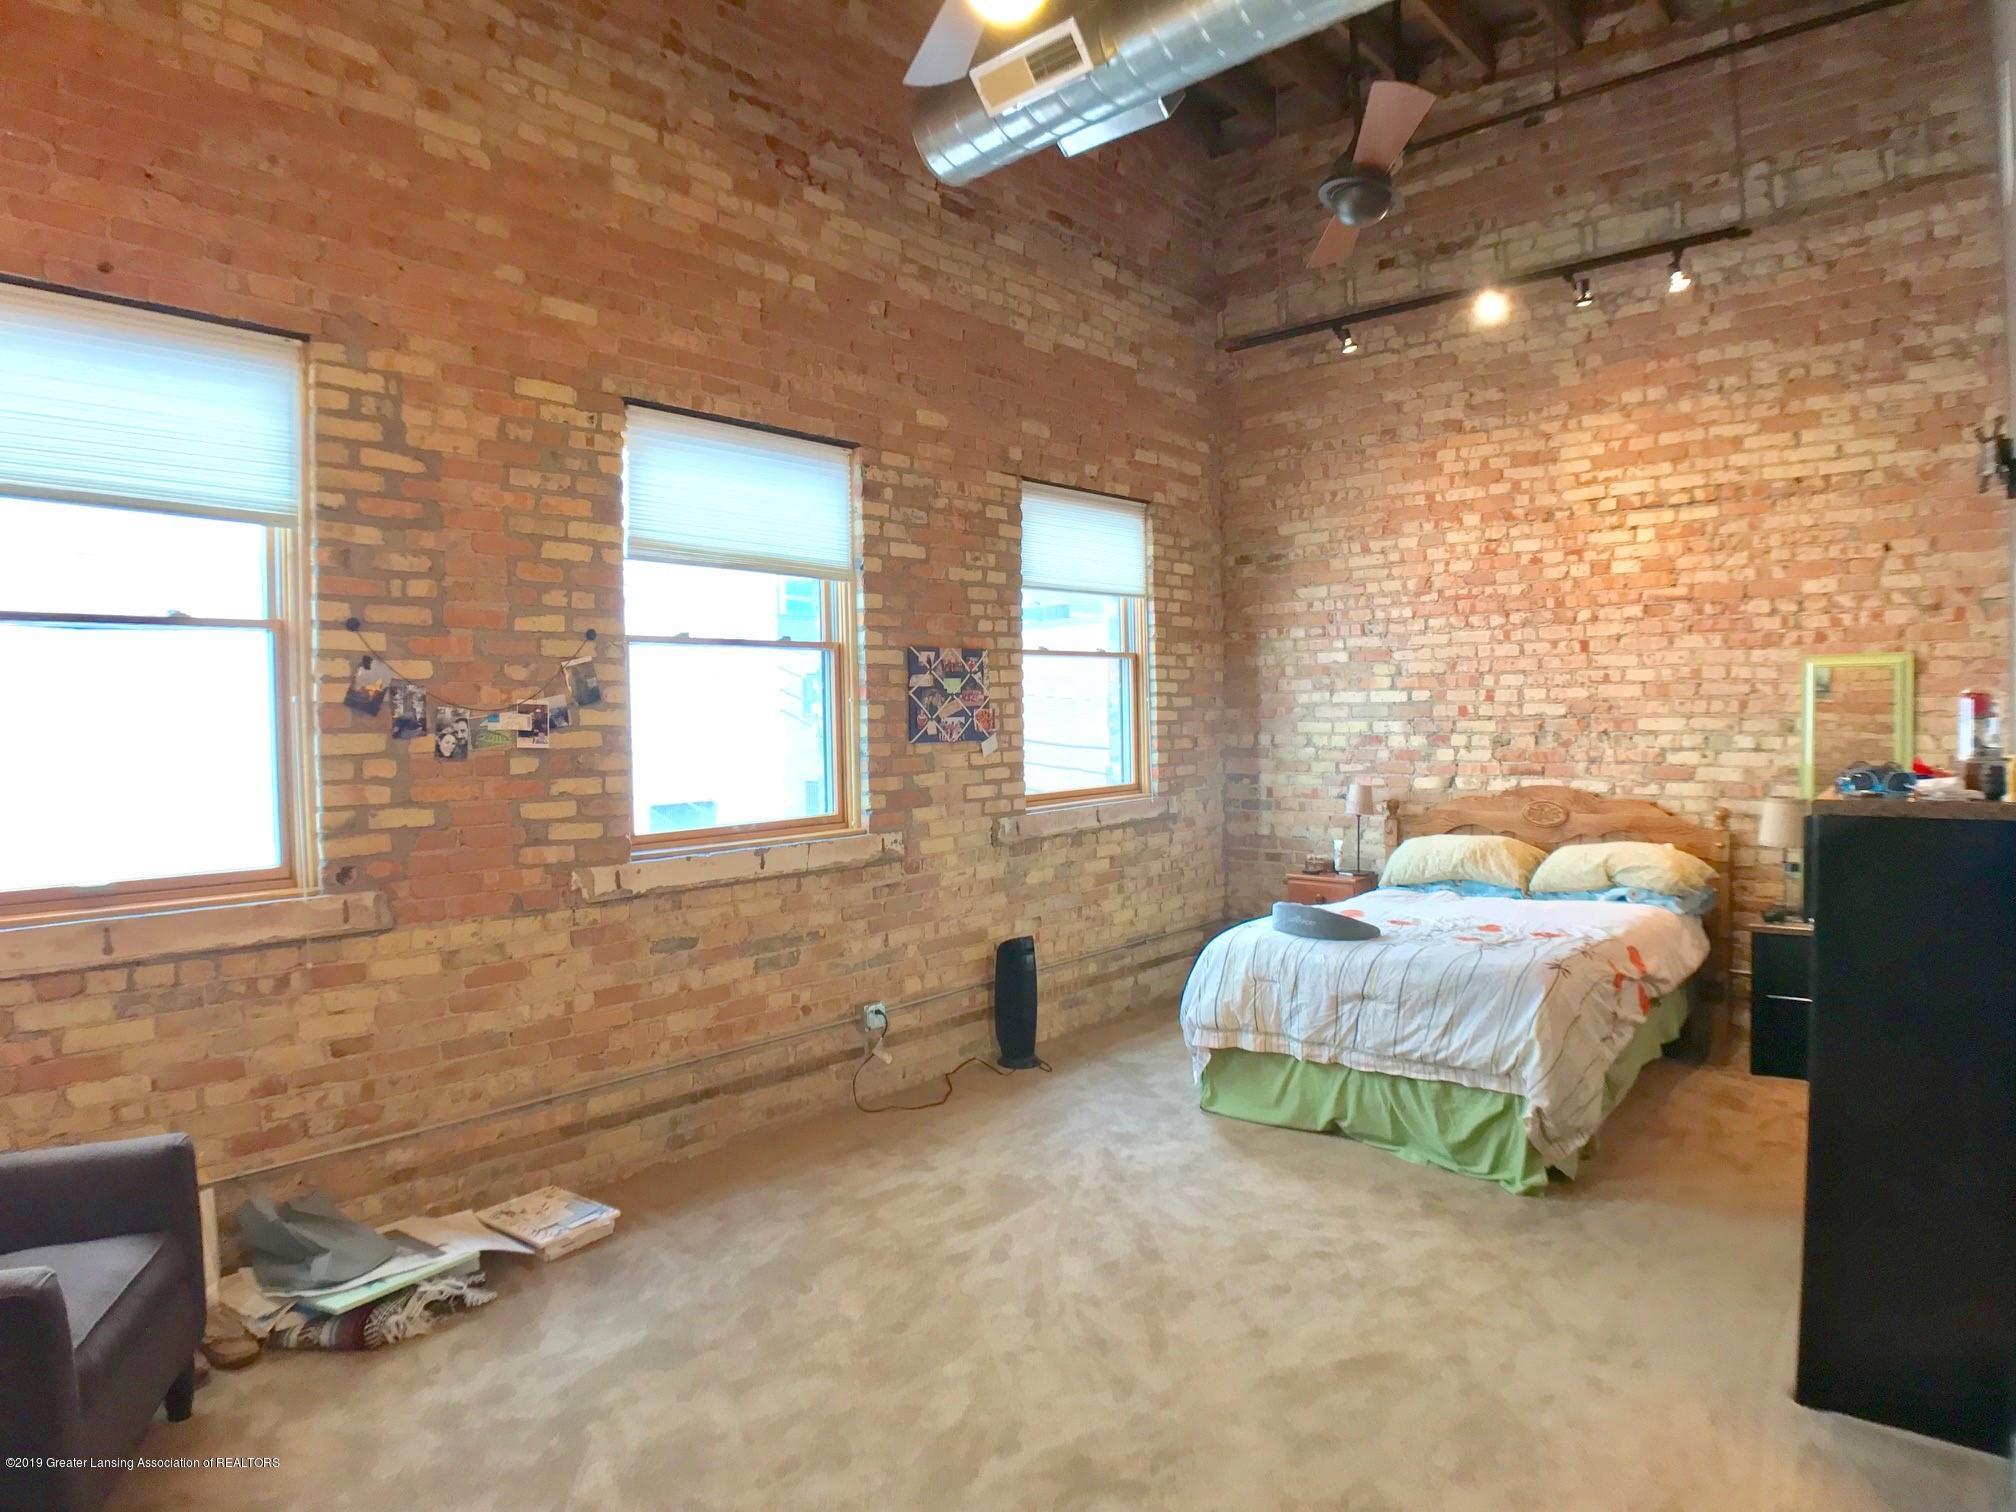 214 S Washington Square 4 - Master Bedroom - 17